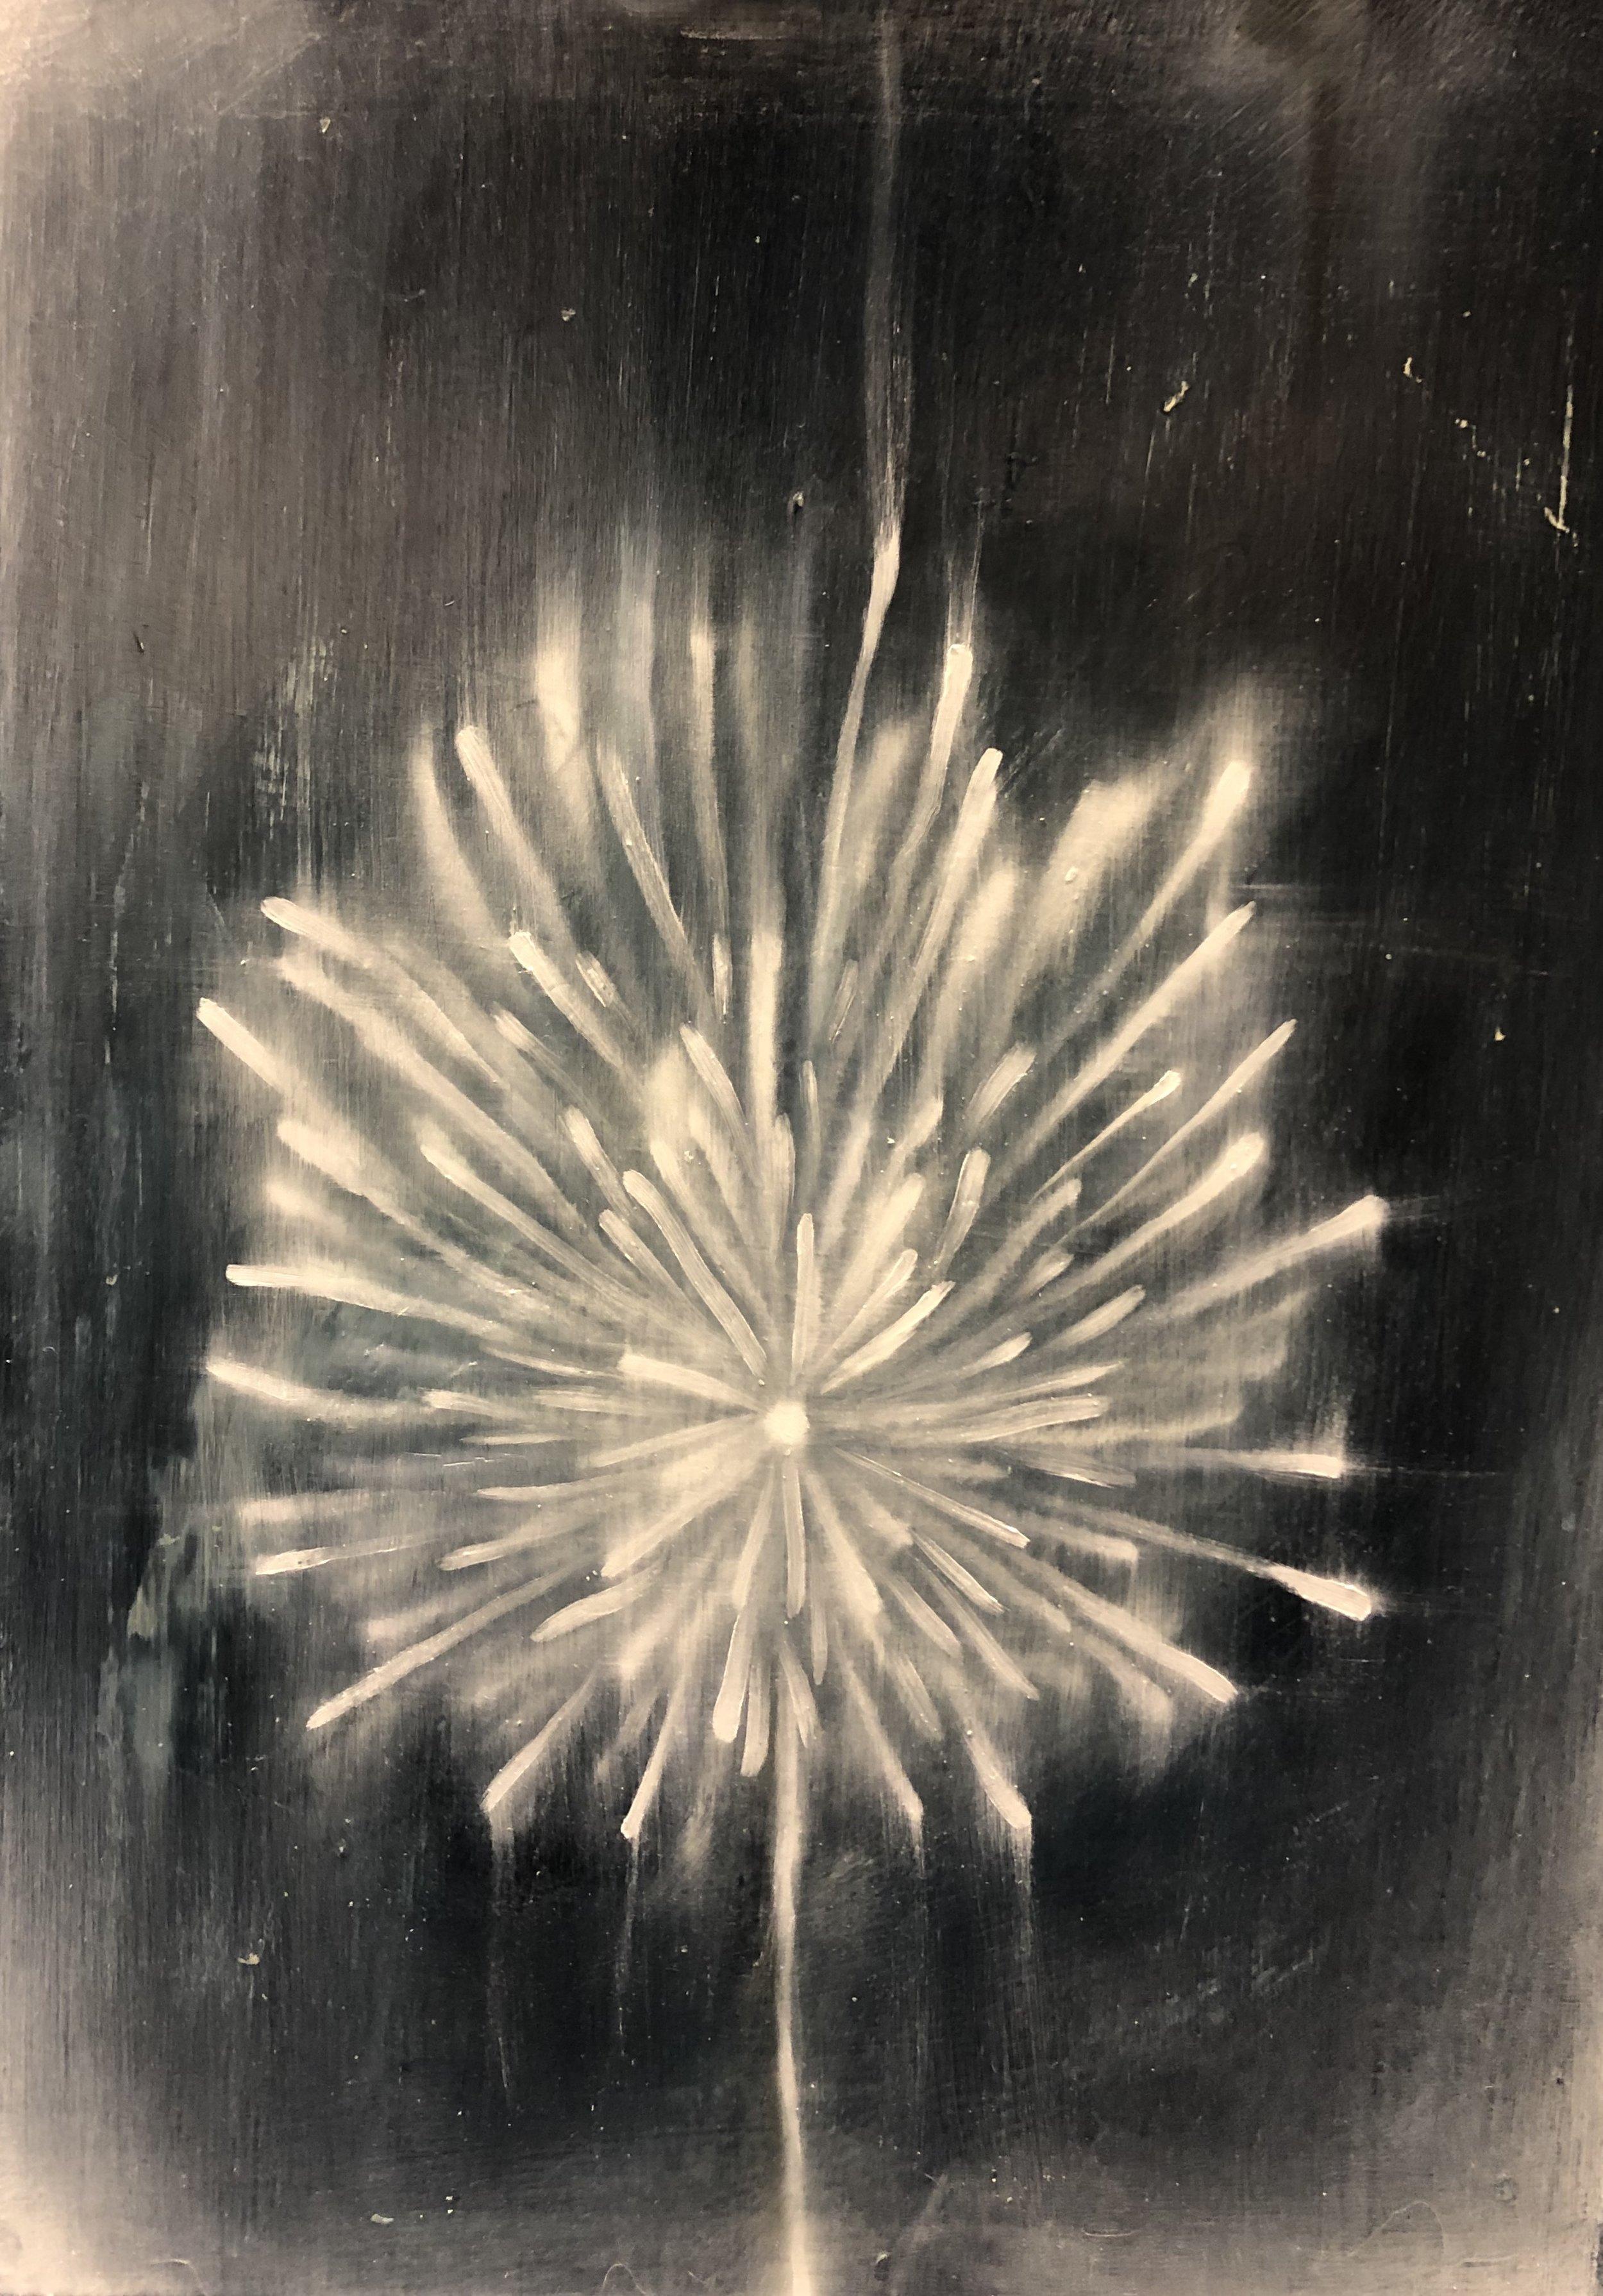 Dandelion #3, 70 x 50 CM, 2019